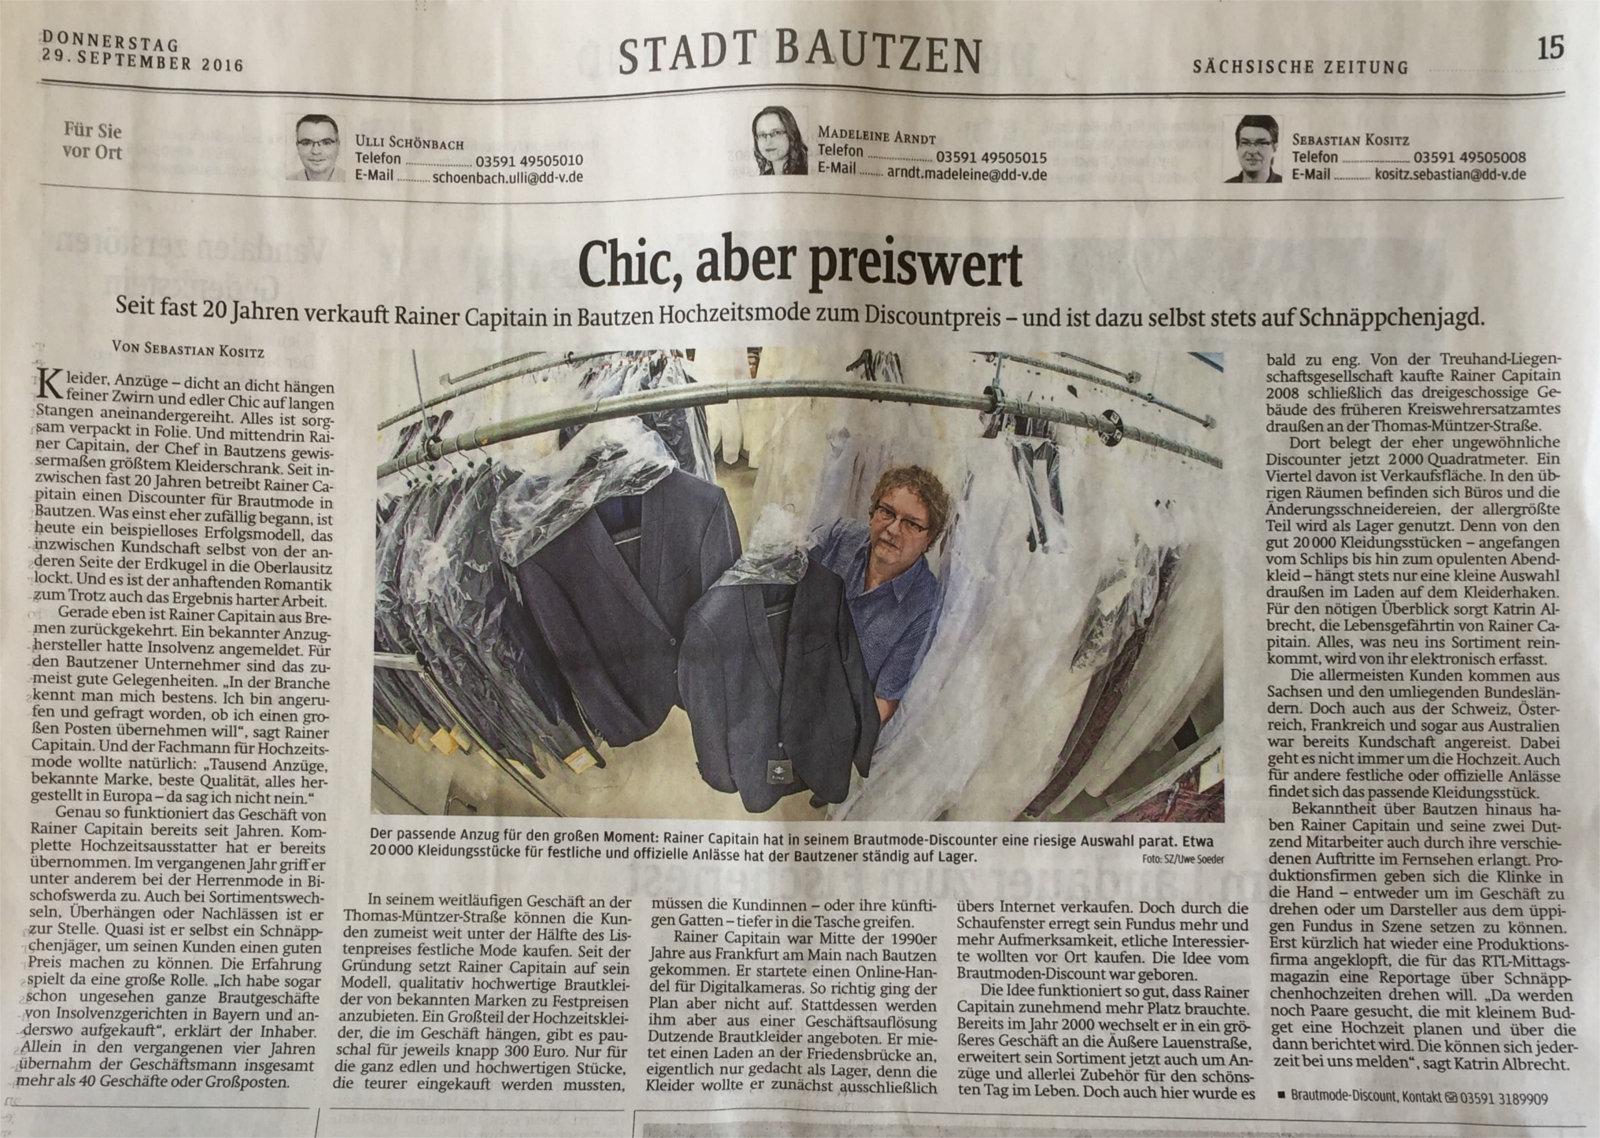 BrautmodeOutlet Bautzen Outlet Brautmode Print Sächsische Zeitung 2016